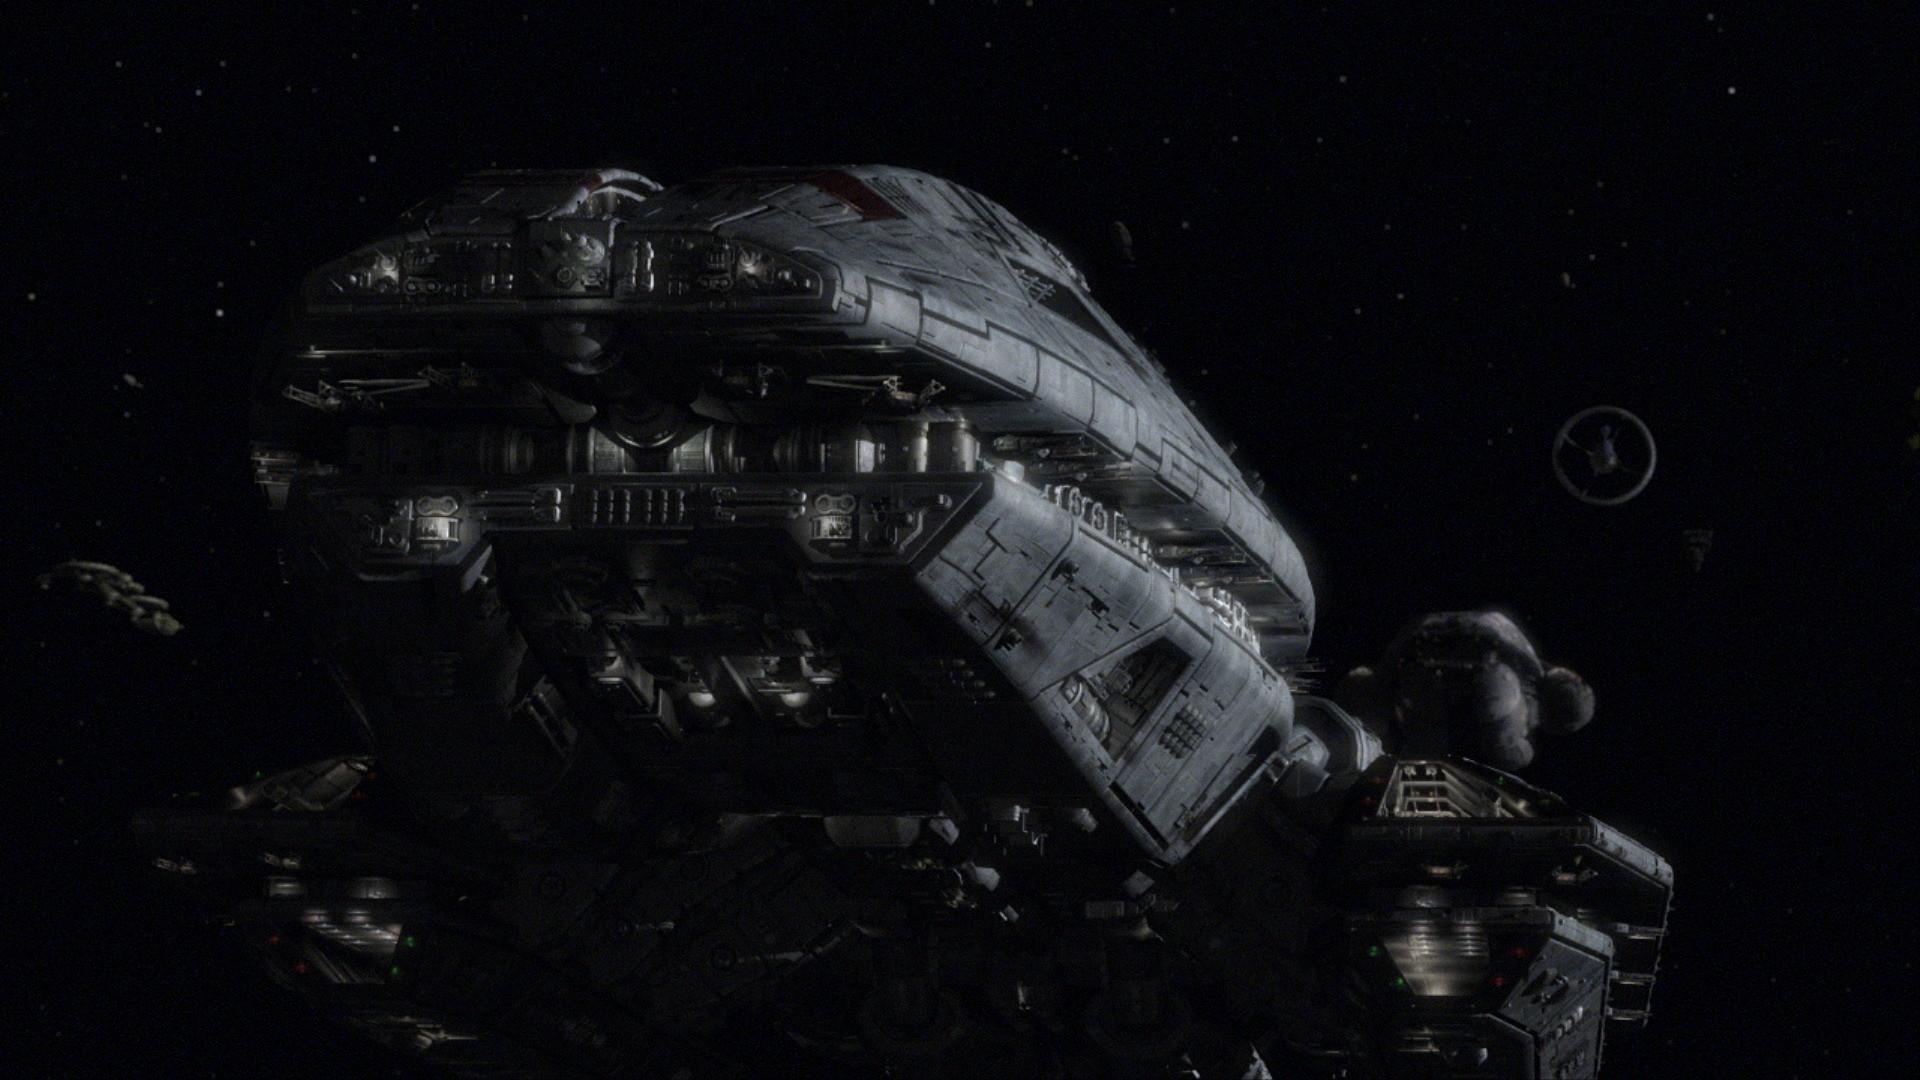 1920x1080 Battlestar Galactica Pegasus 202041